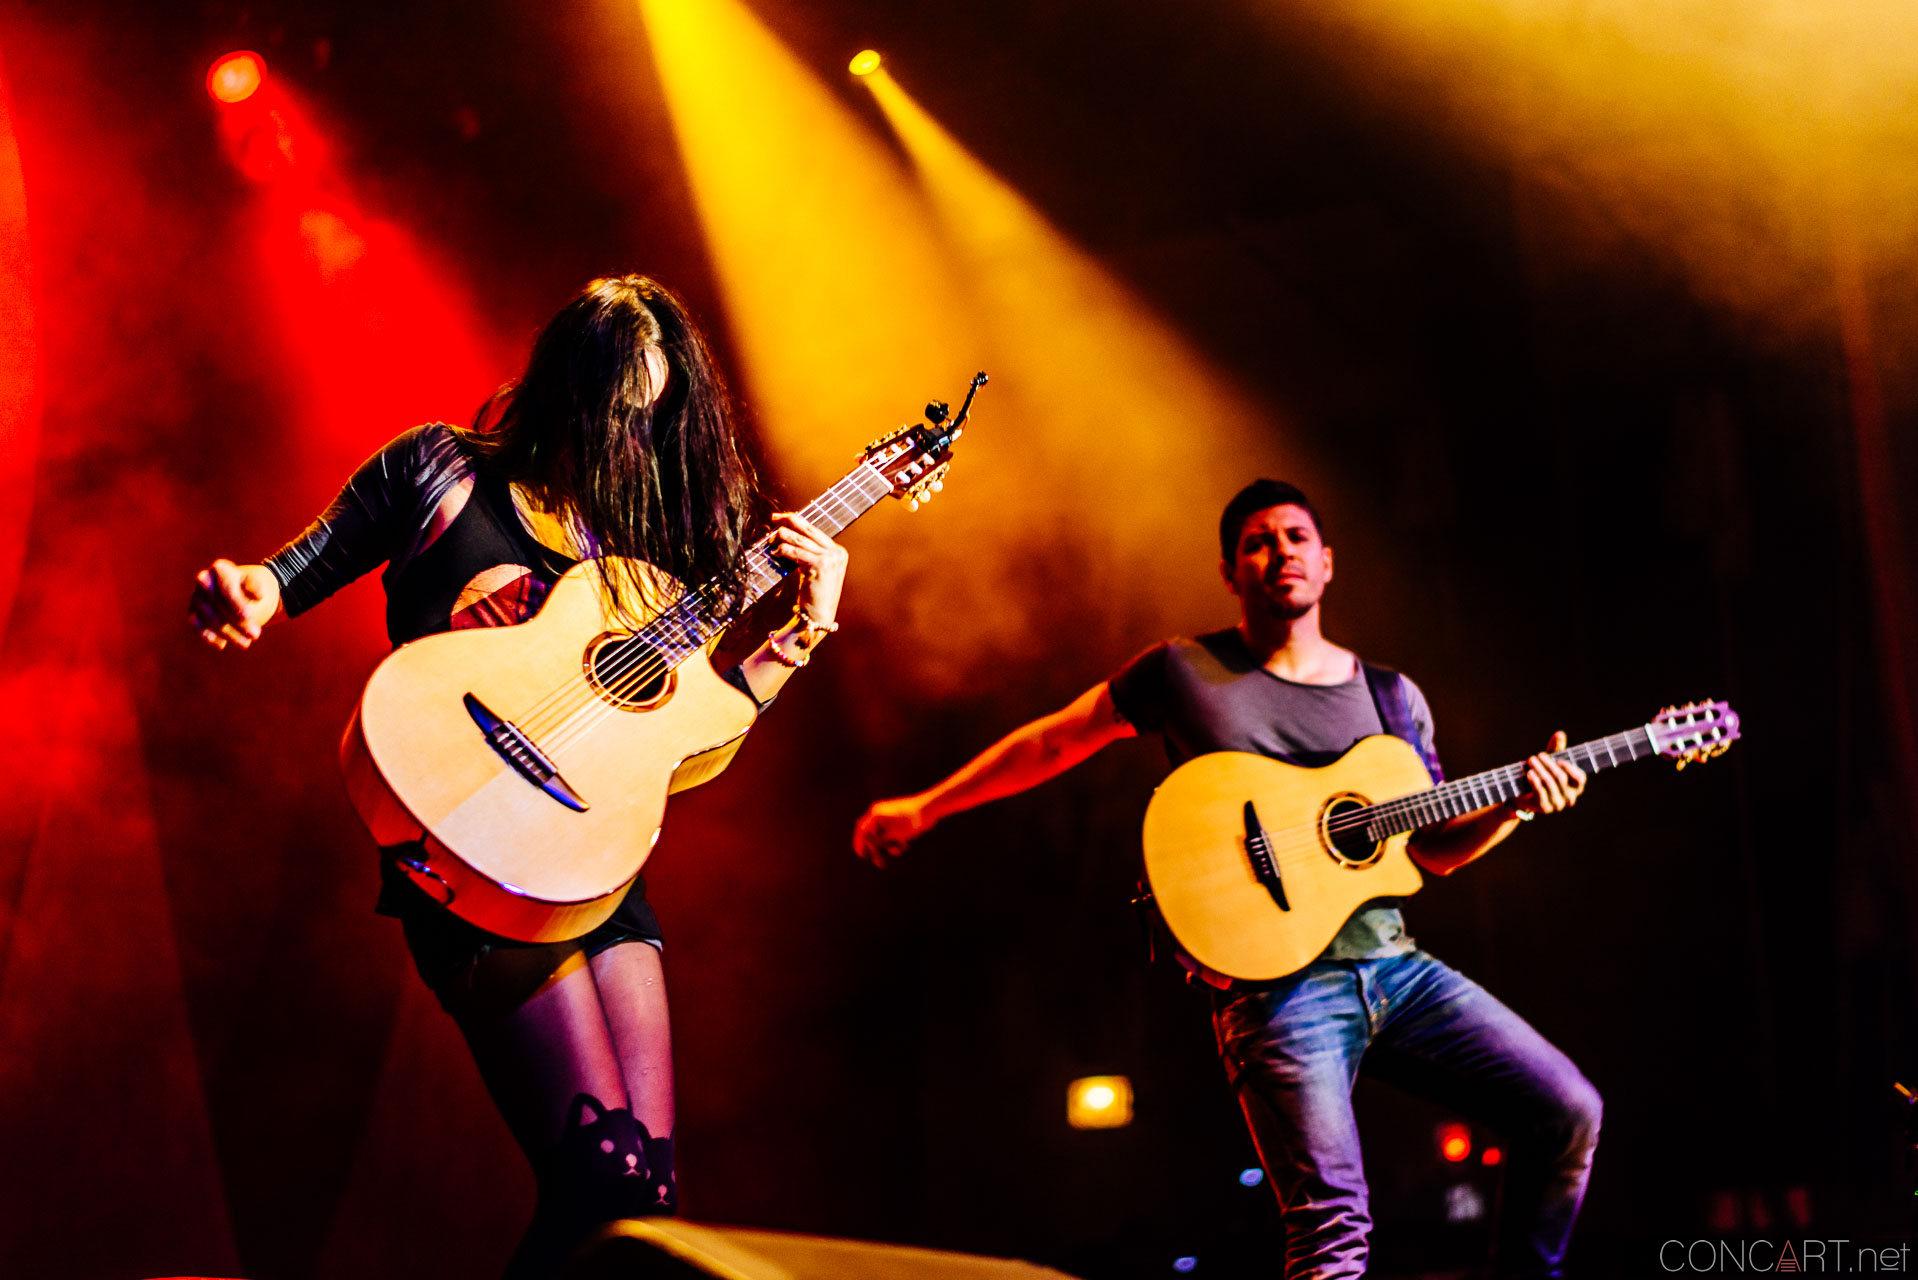 Rodrigo y Gabriela photo by Sean Molin. concART   The Art Of Live